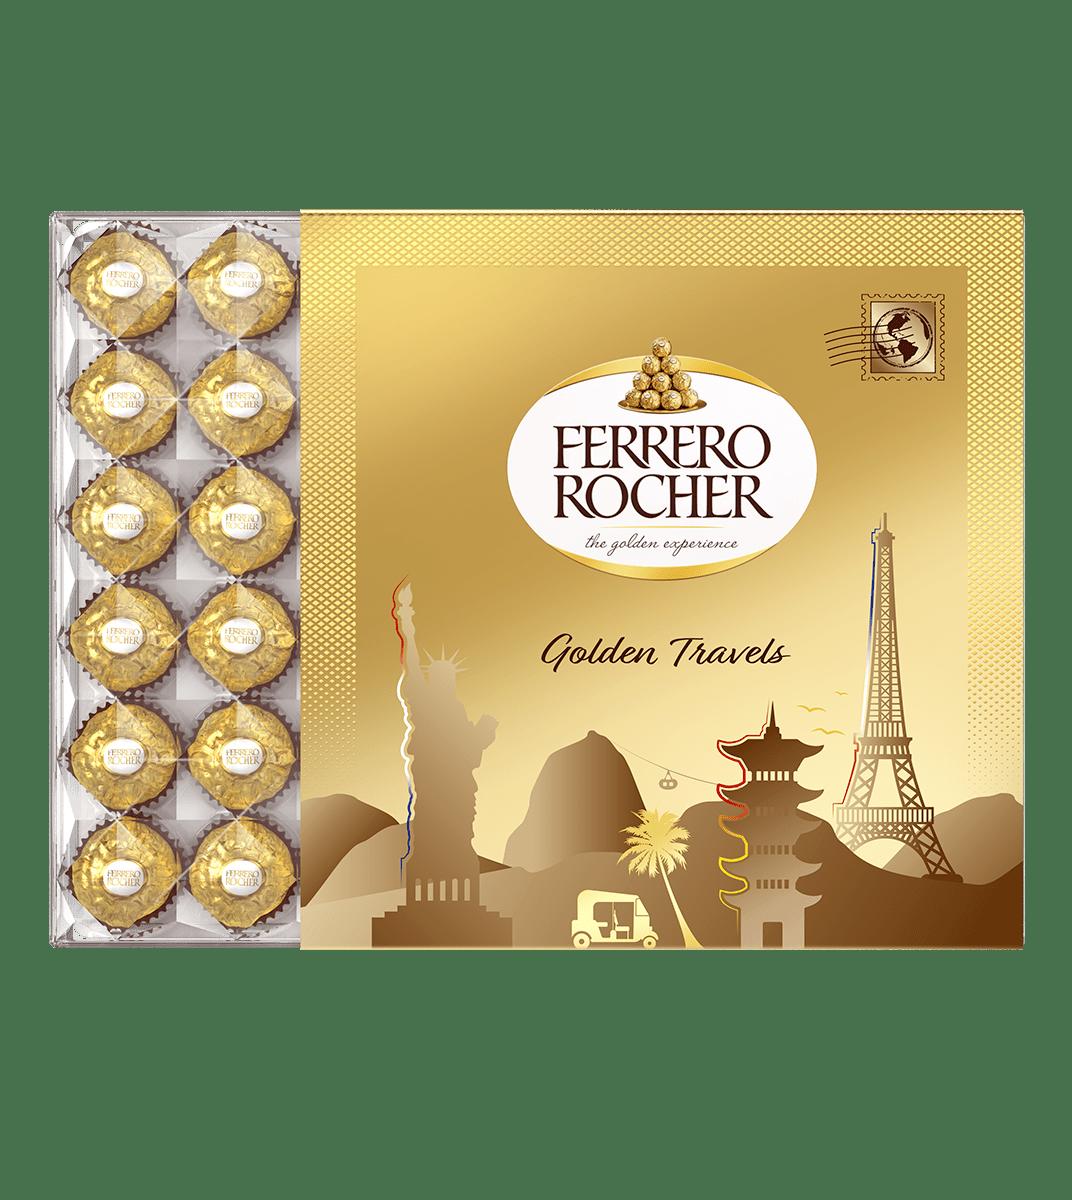 Travel Market - Ferrero Rocher World Travel